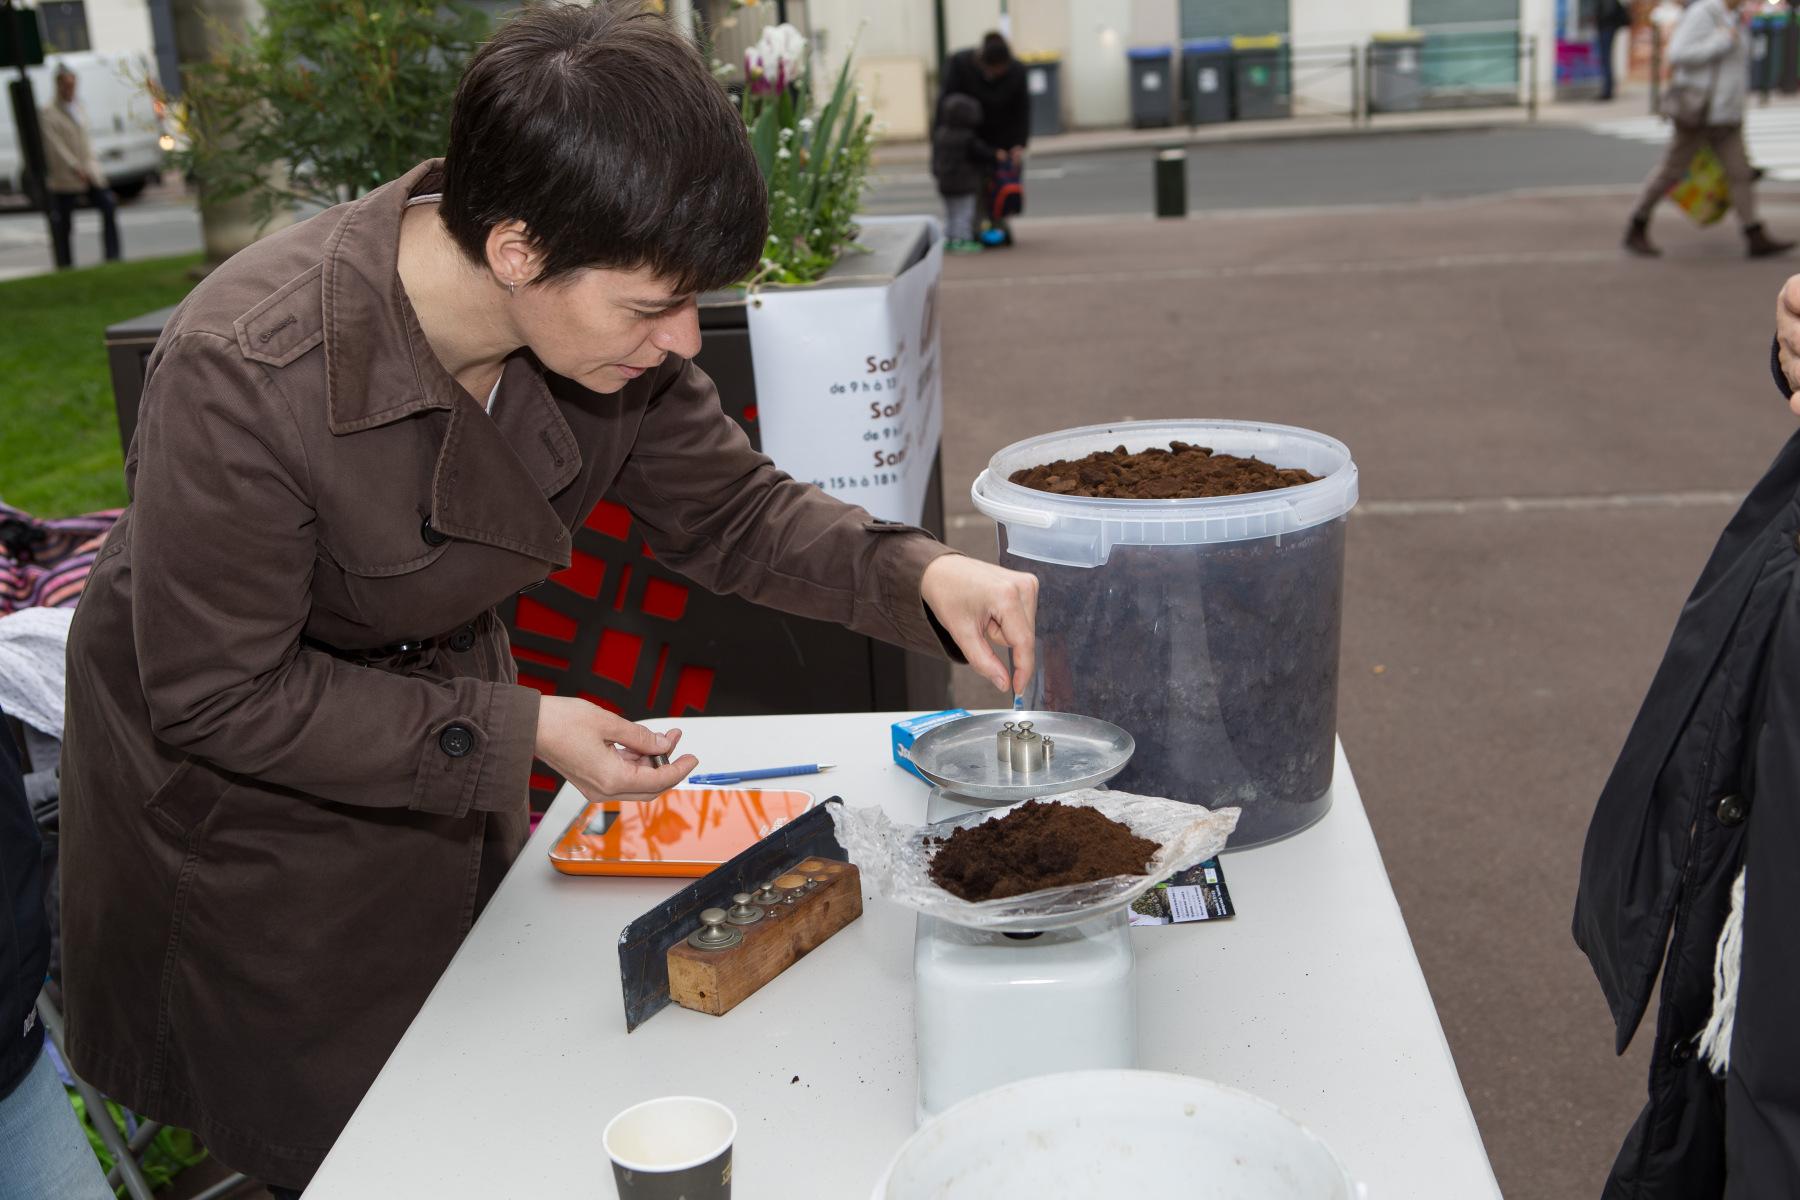 Marc de café Lien vers: https://colibris-wiki.org/valleesud92/wakka.php?wiki=MarcdeCafe